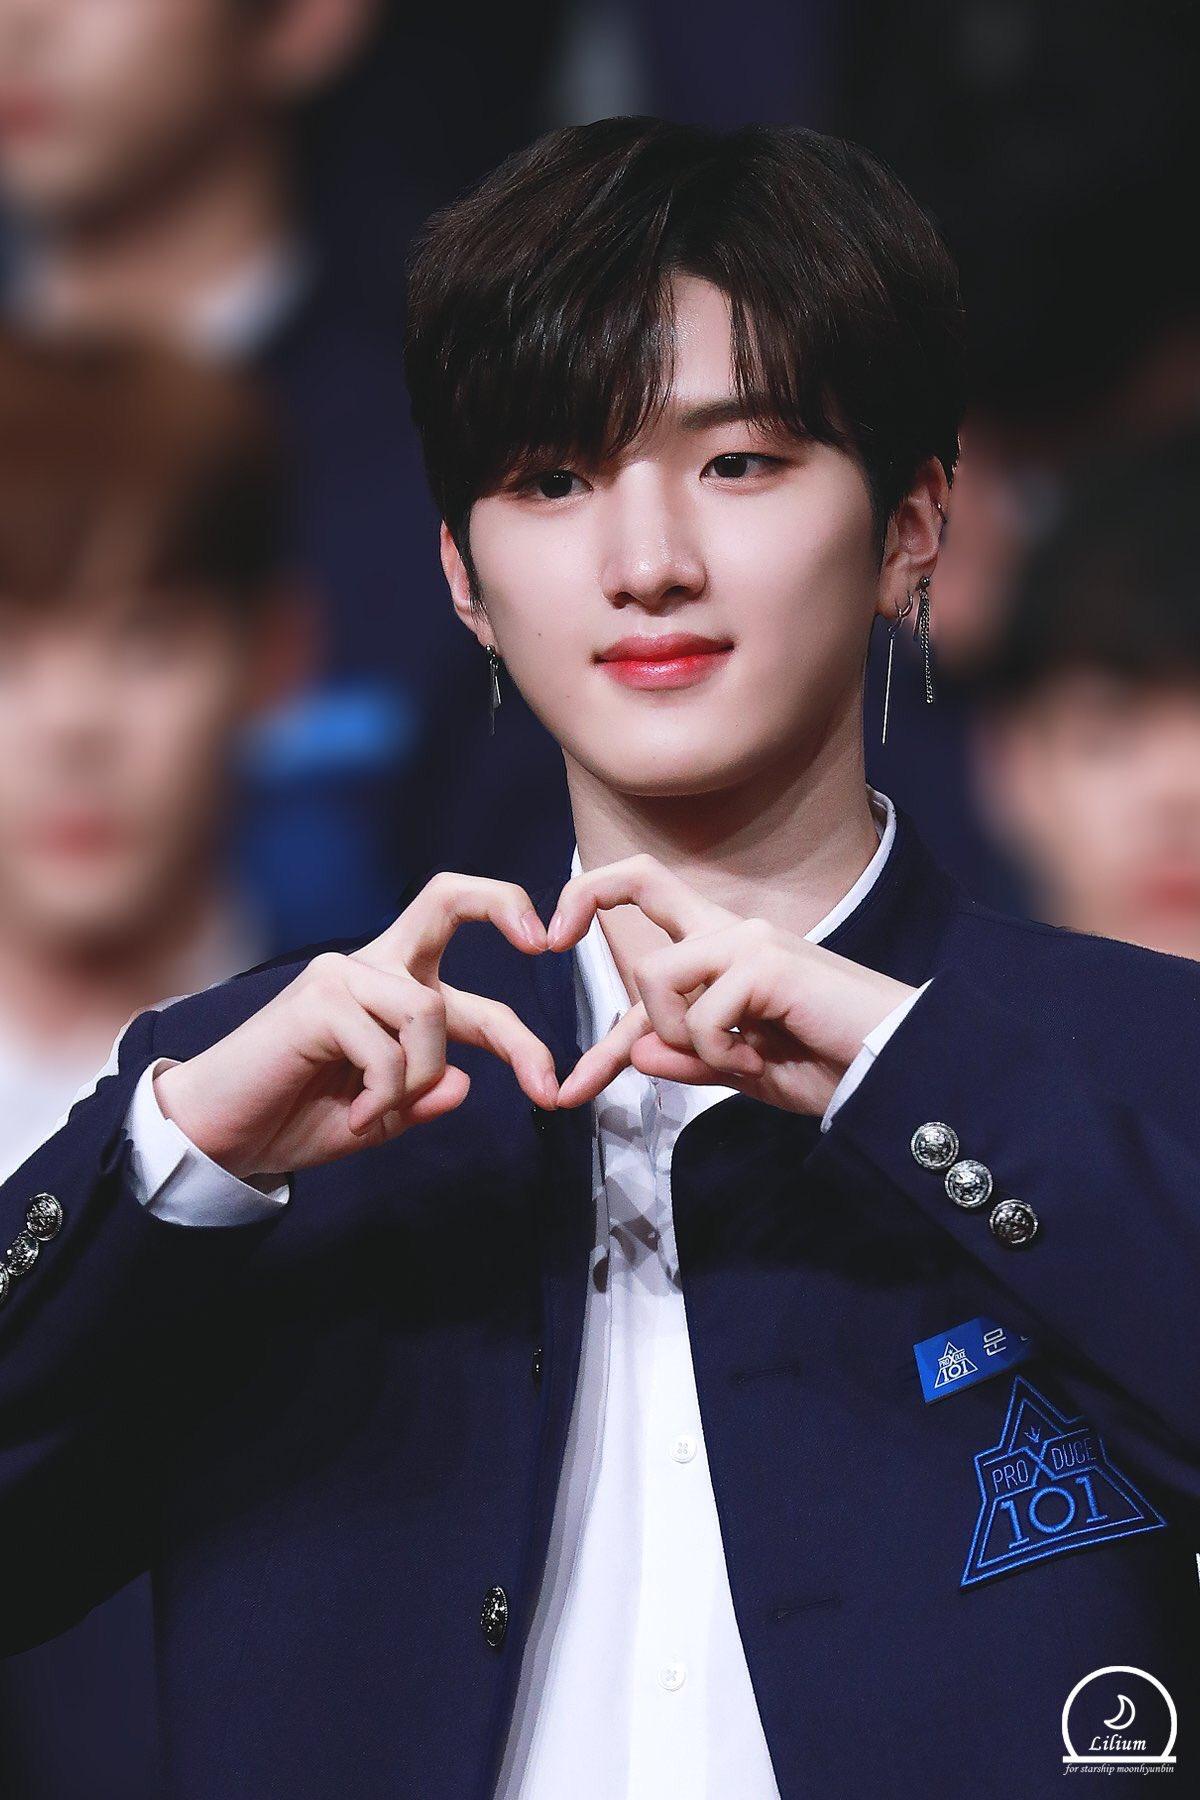 produce x 101, produce x 101 trainees, produce x 101 members, produce x 101 height, produce x 101 company, kpop, trainee, produce x 101 moon hyunbin, moon hyunbin